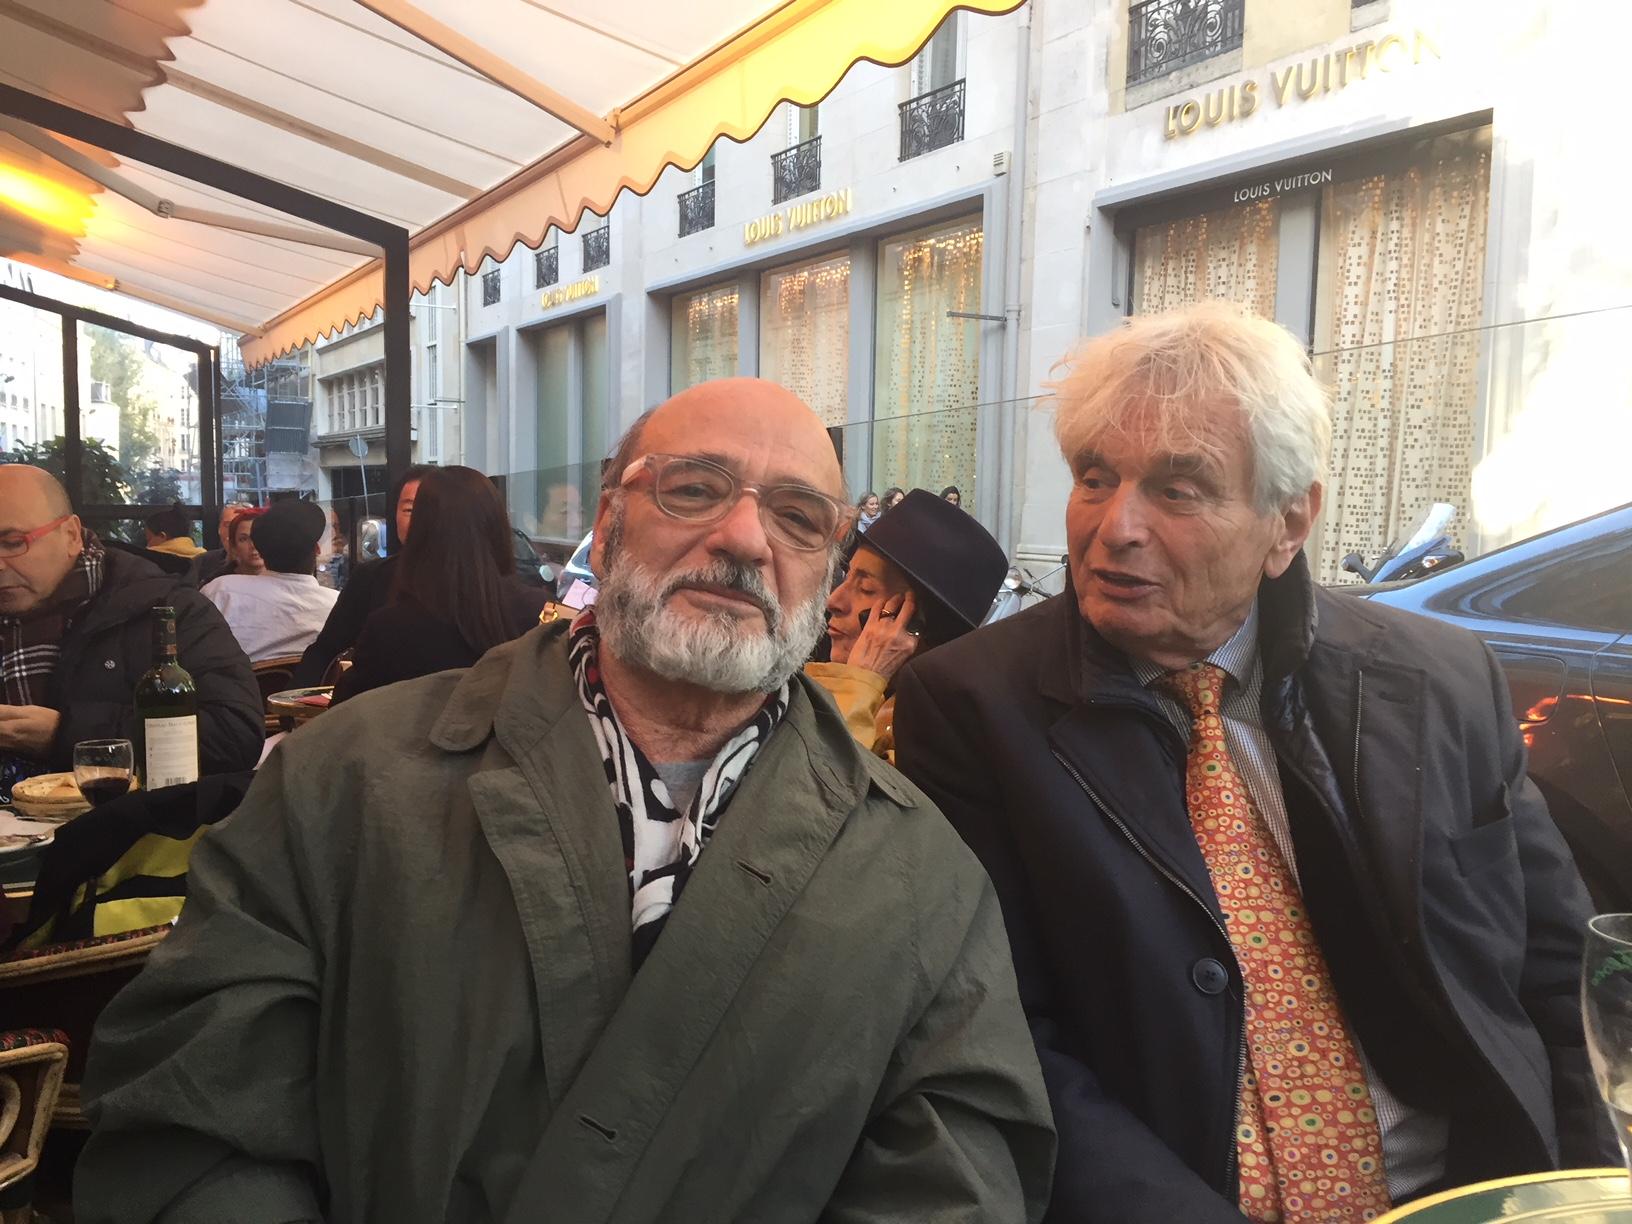 With Dr. Reimar Schefold in Paris.